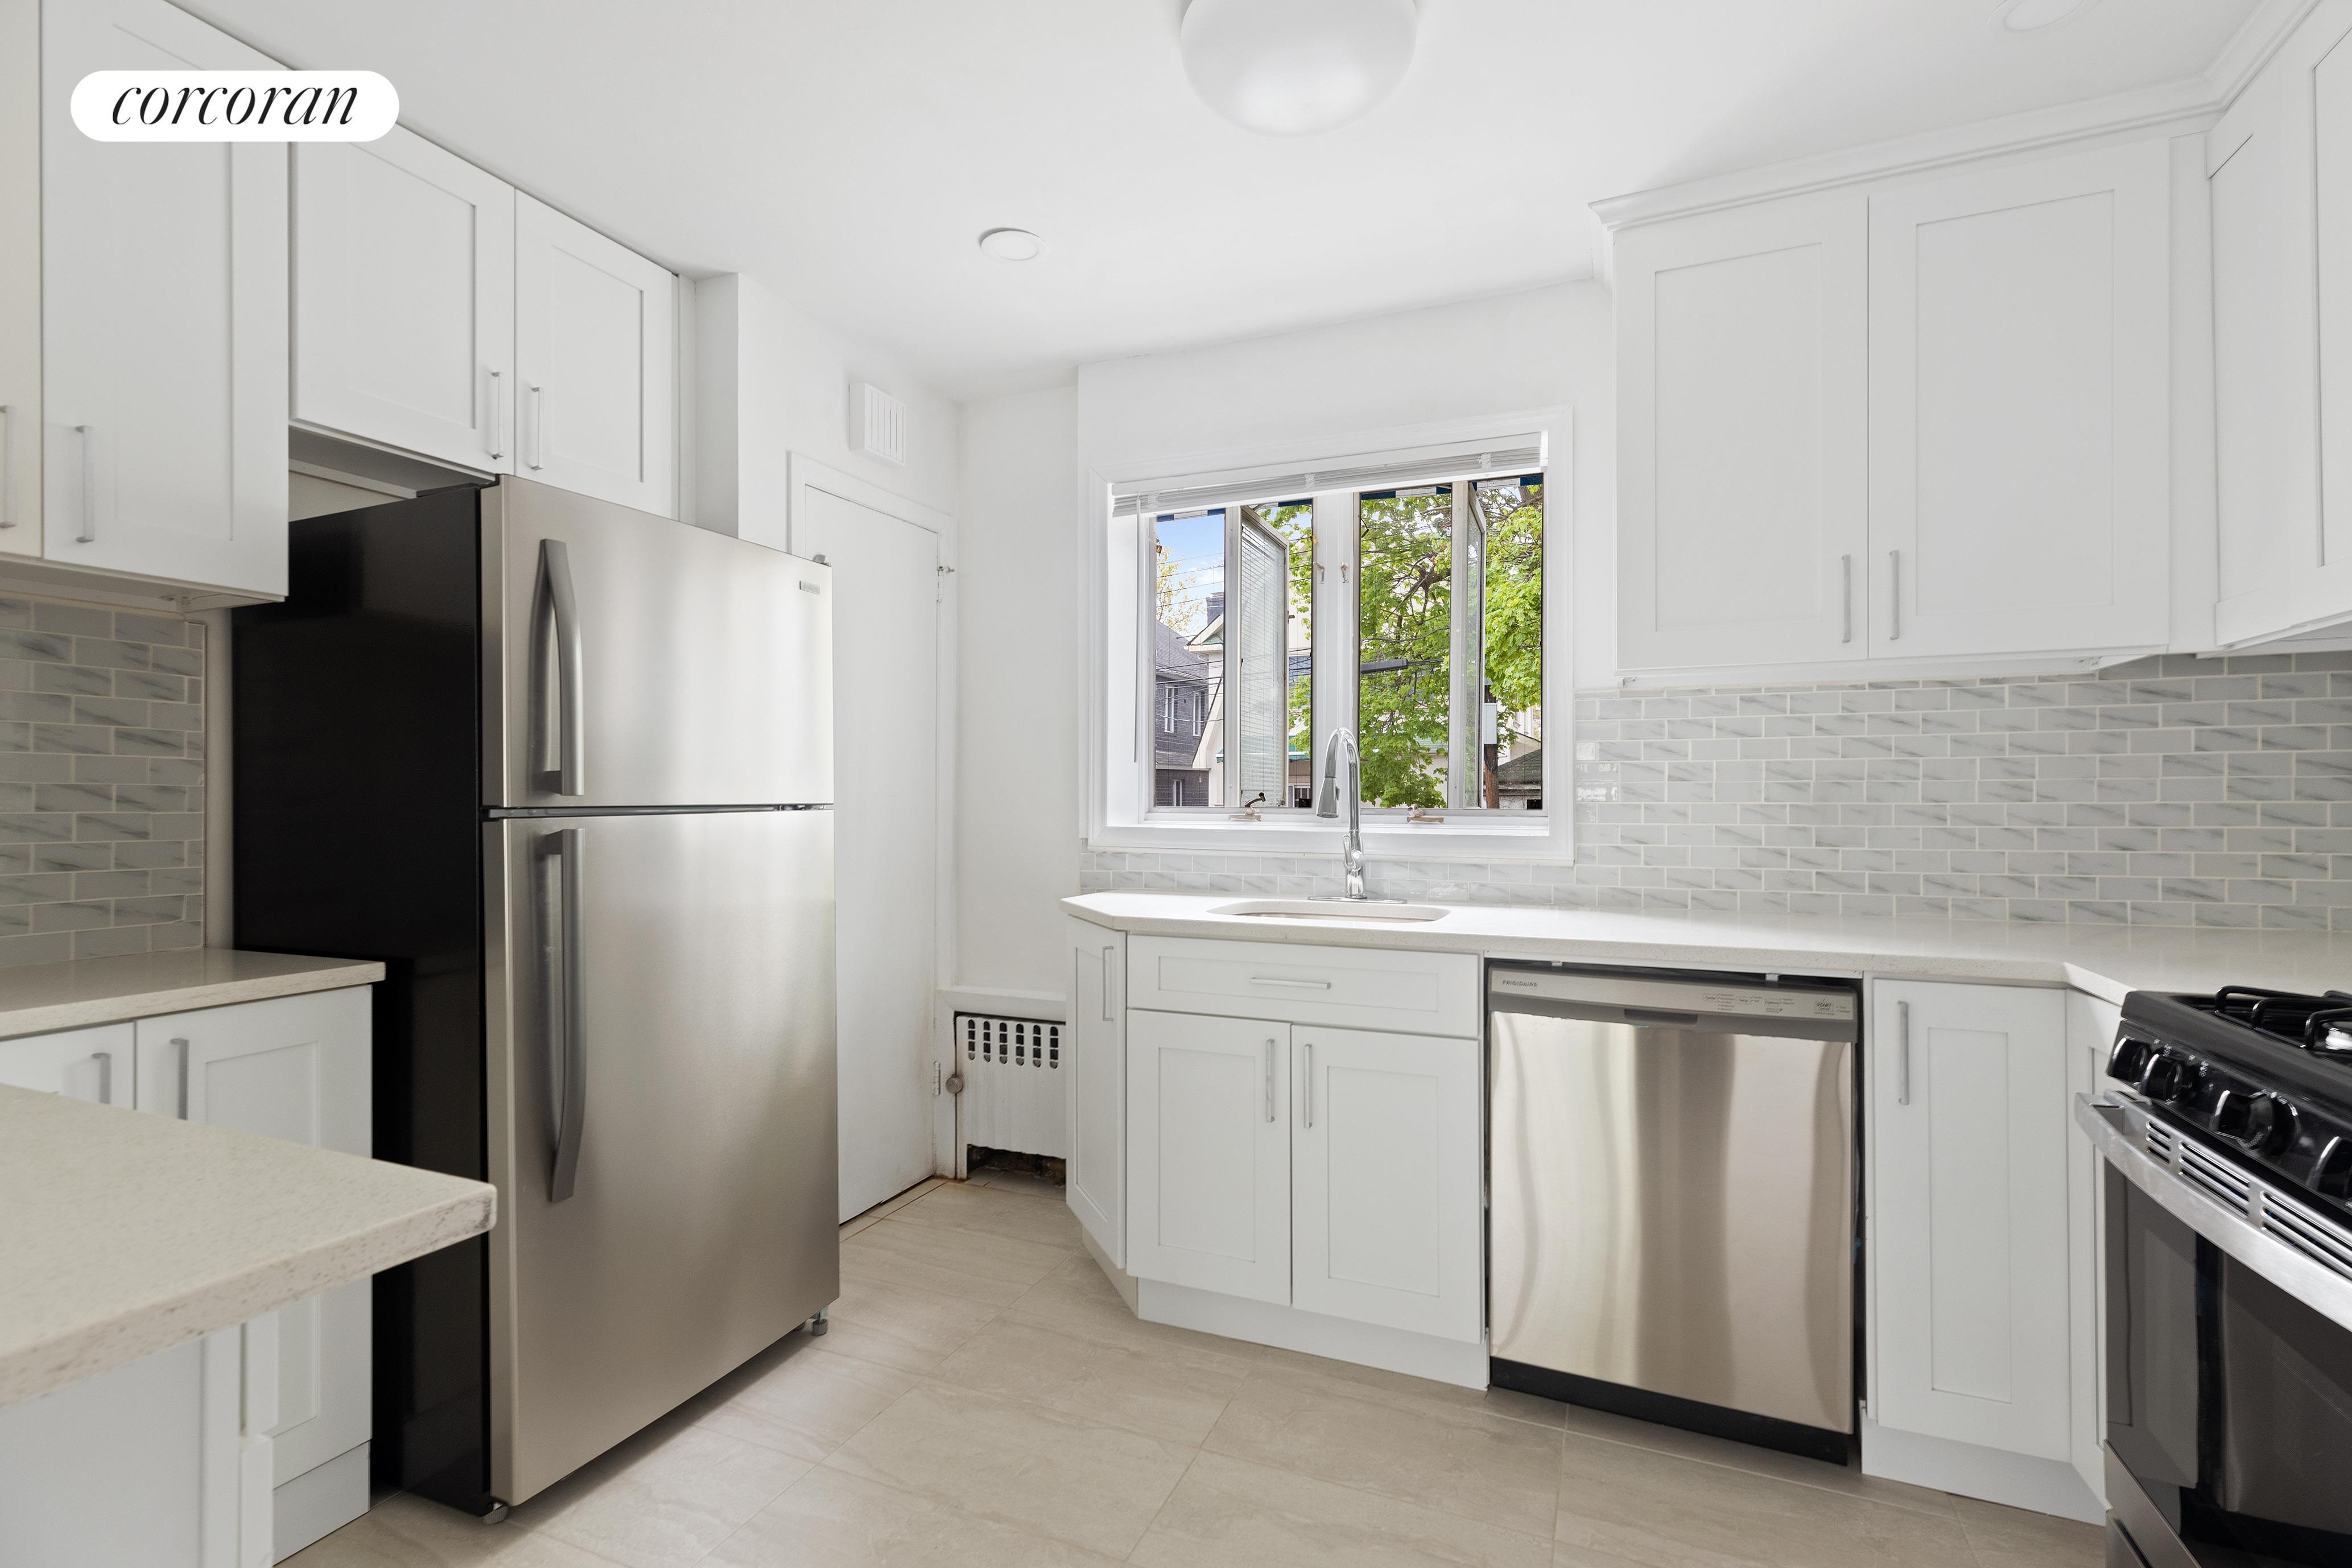 928 East 26th Street Flatbush Brooklyn NY 11210